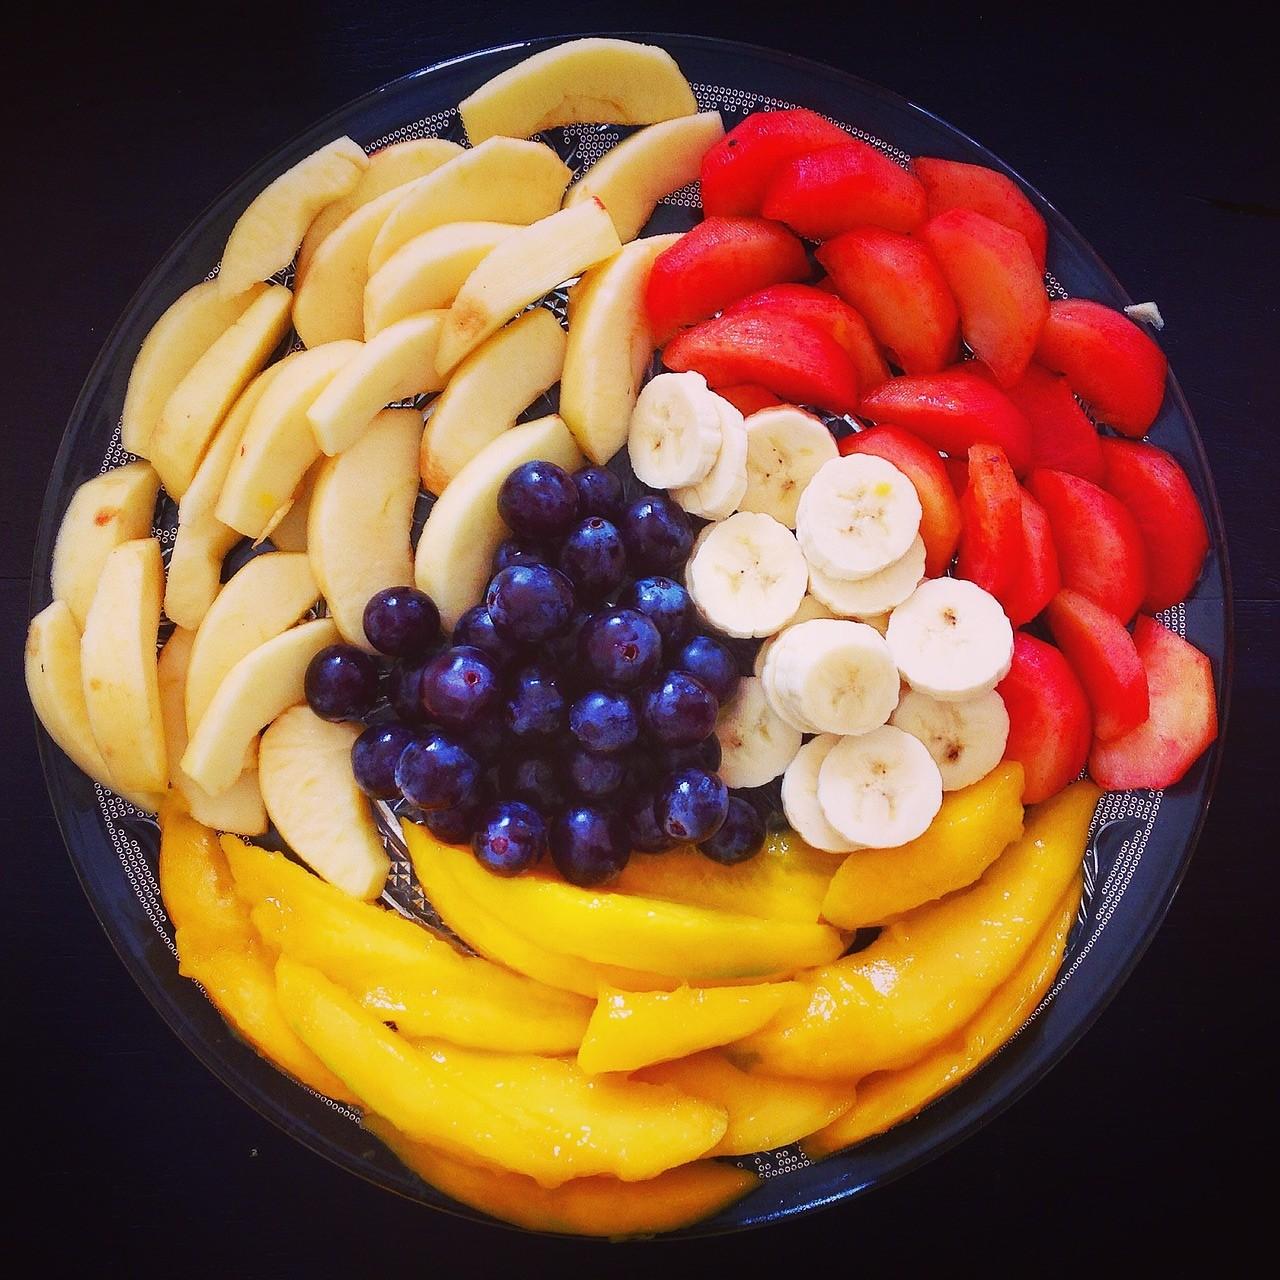 fruit-962279_1280